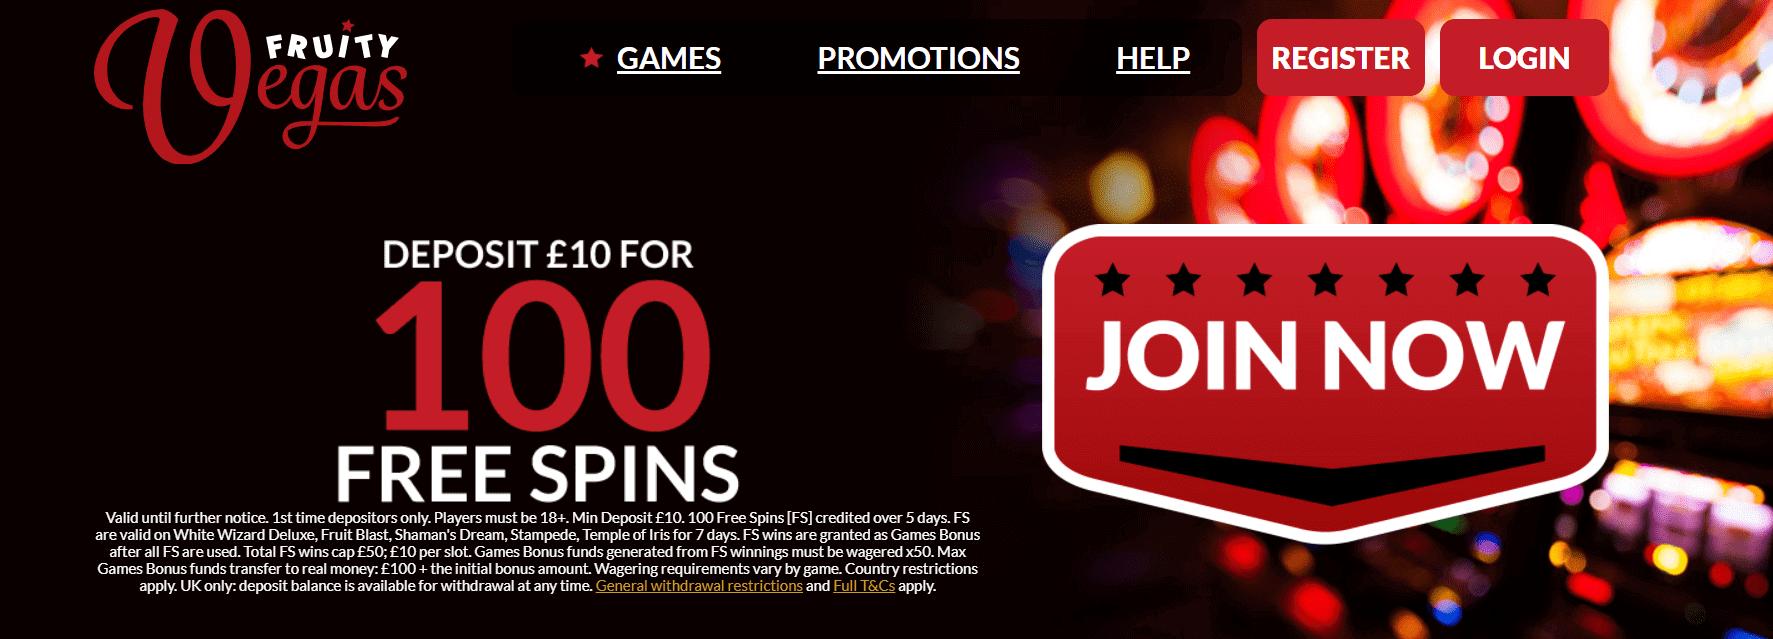 fruity vegas casino bonus